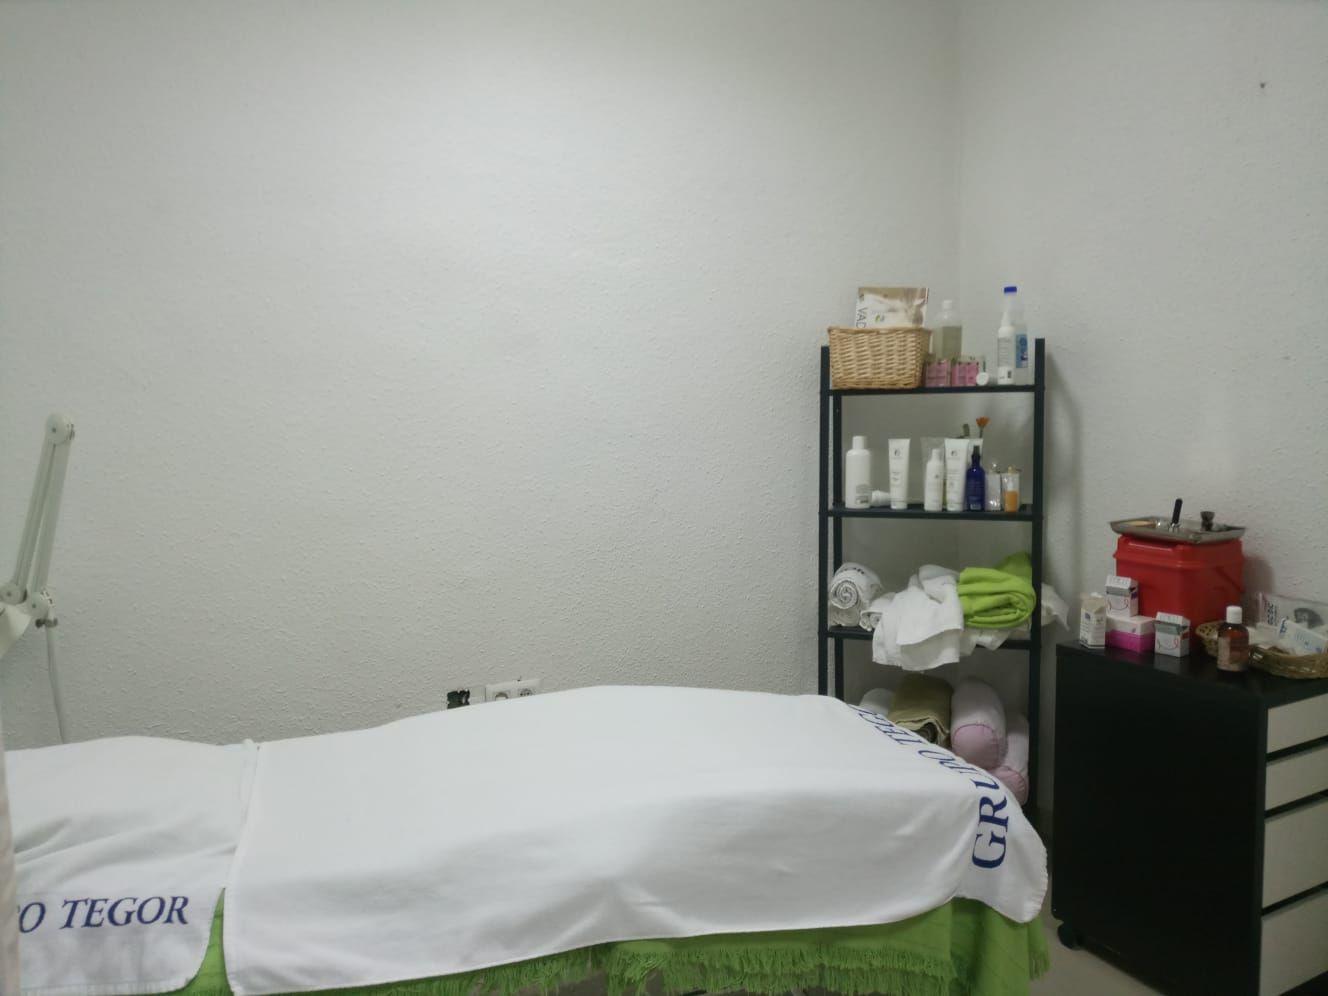 Quiromasaje: Servicios de Somos Natural